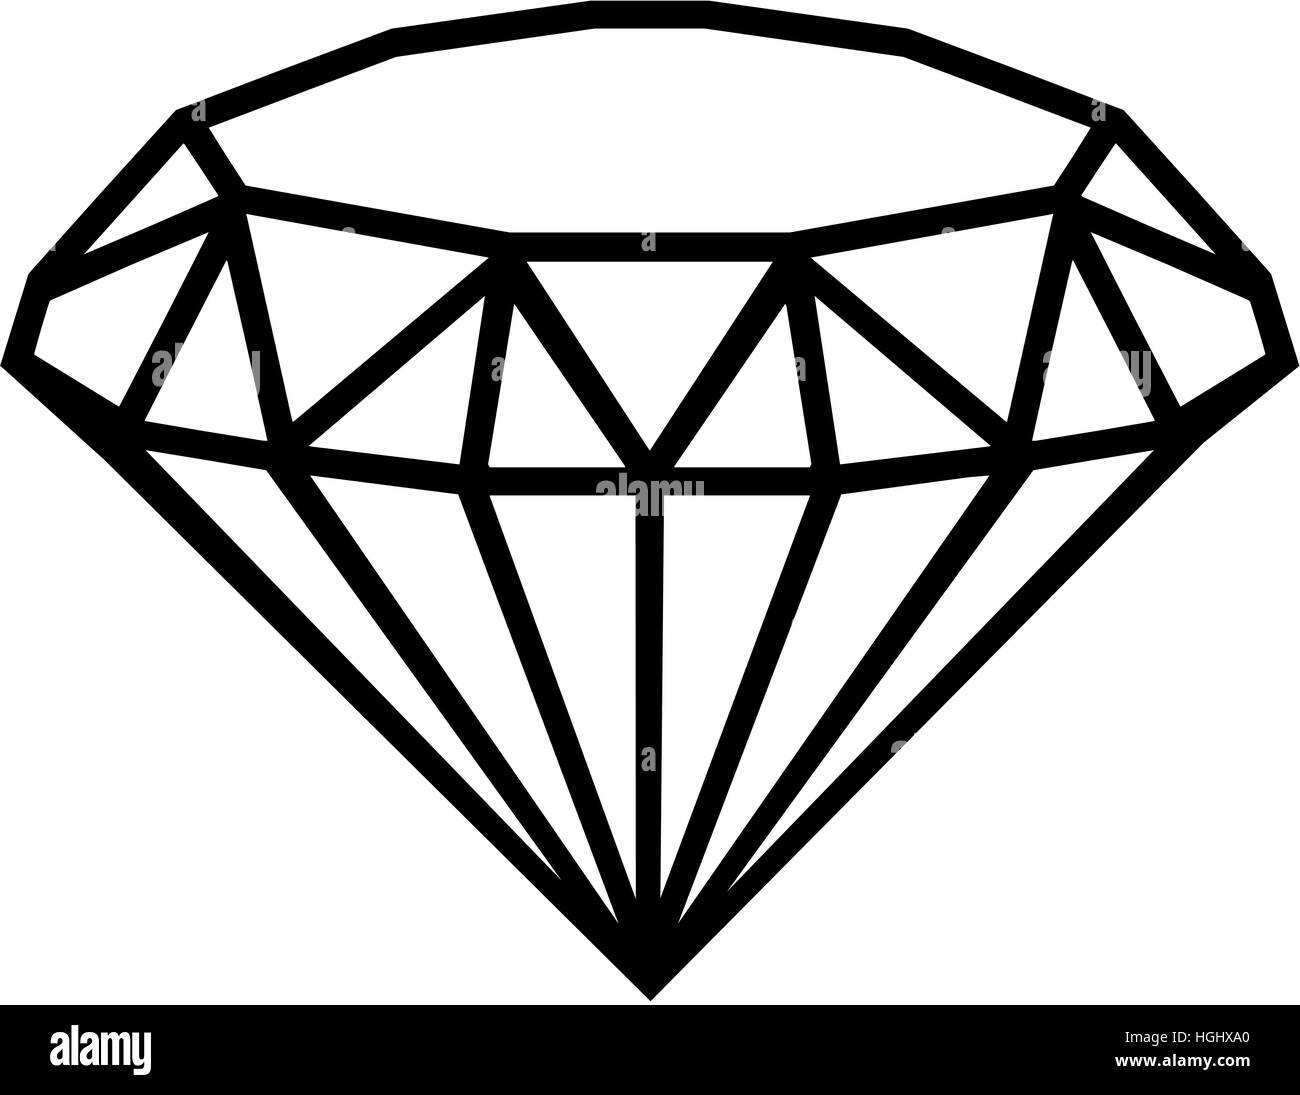 Diamond outline - Stock Image